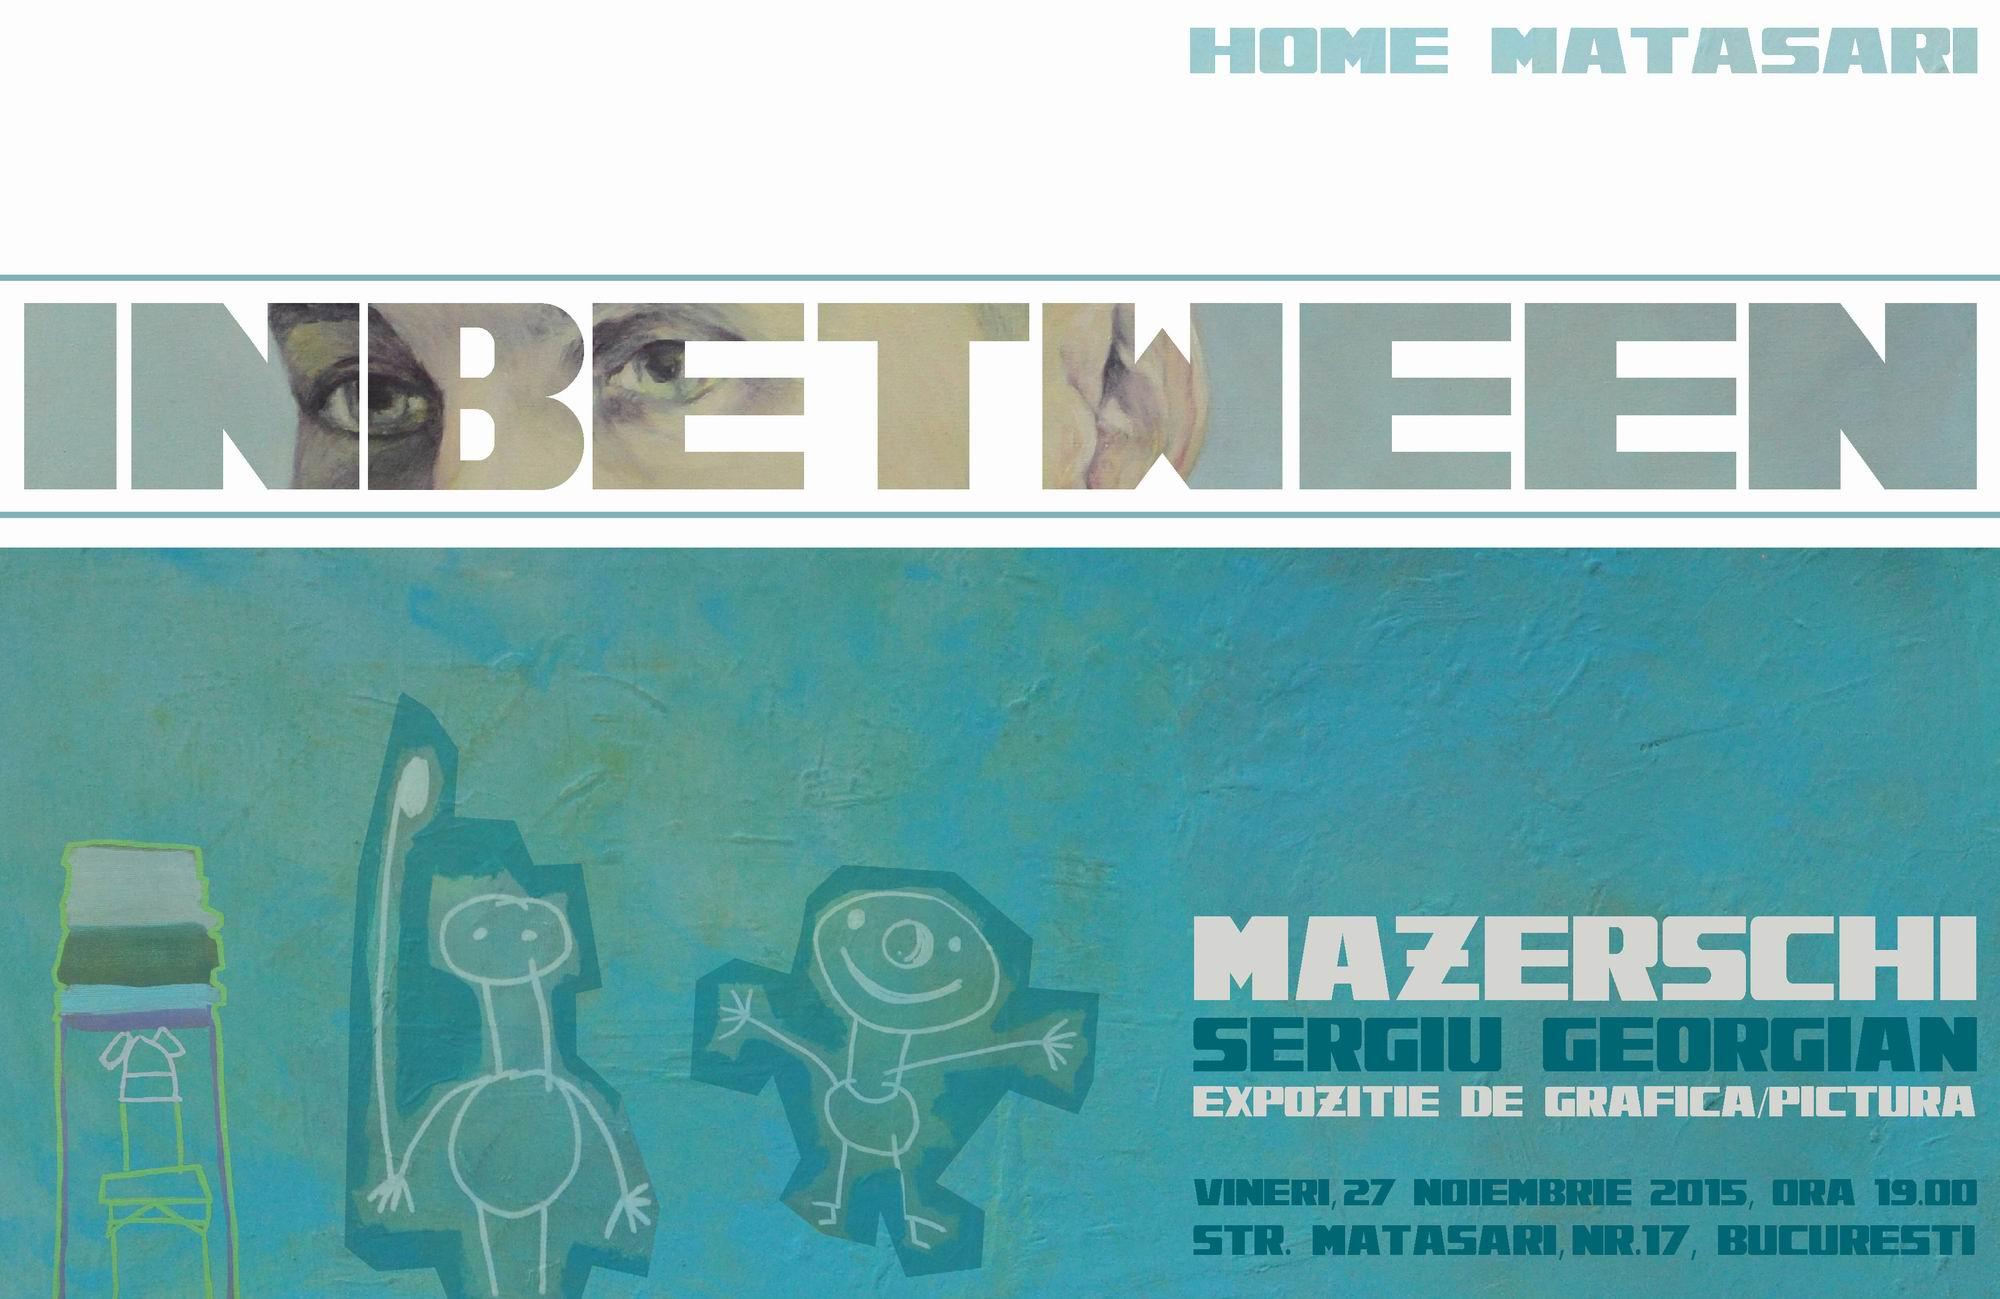 INBETWEEN – Mazerschi Sergiu Georgian @ Home Matăsari